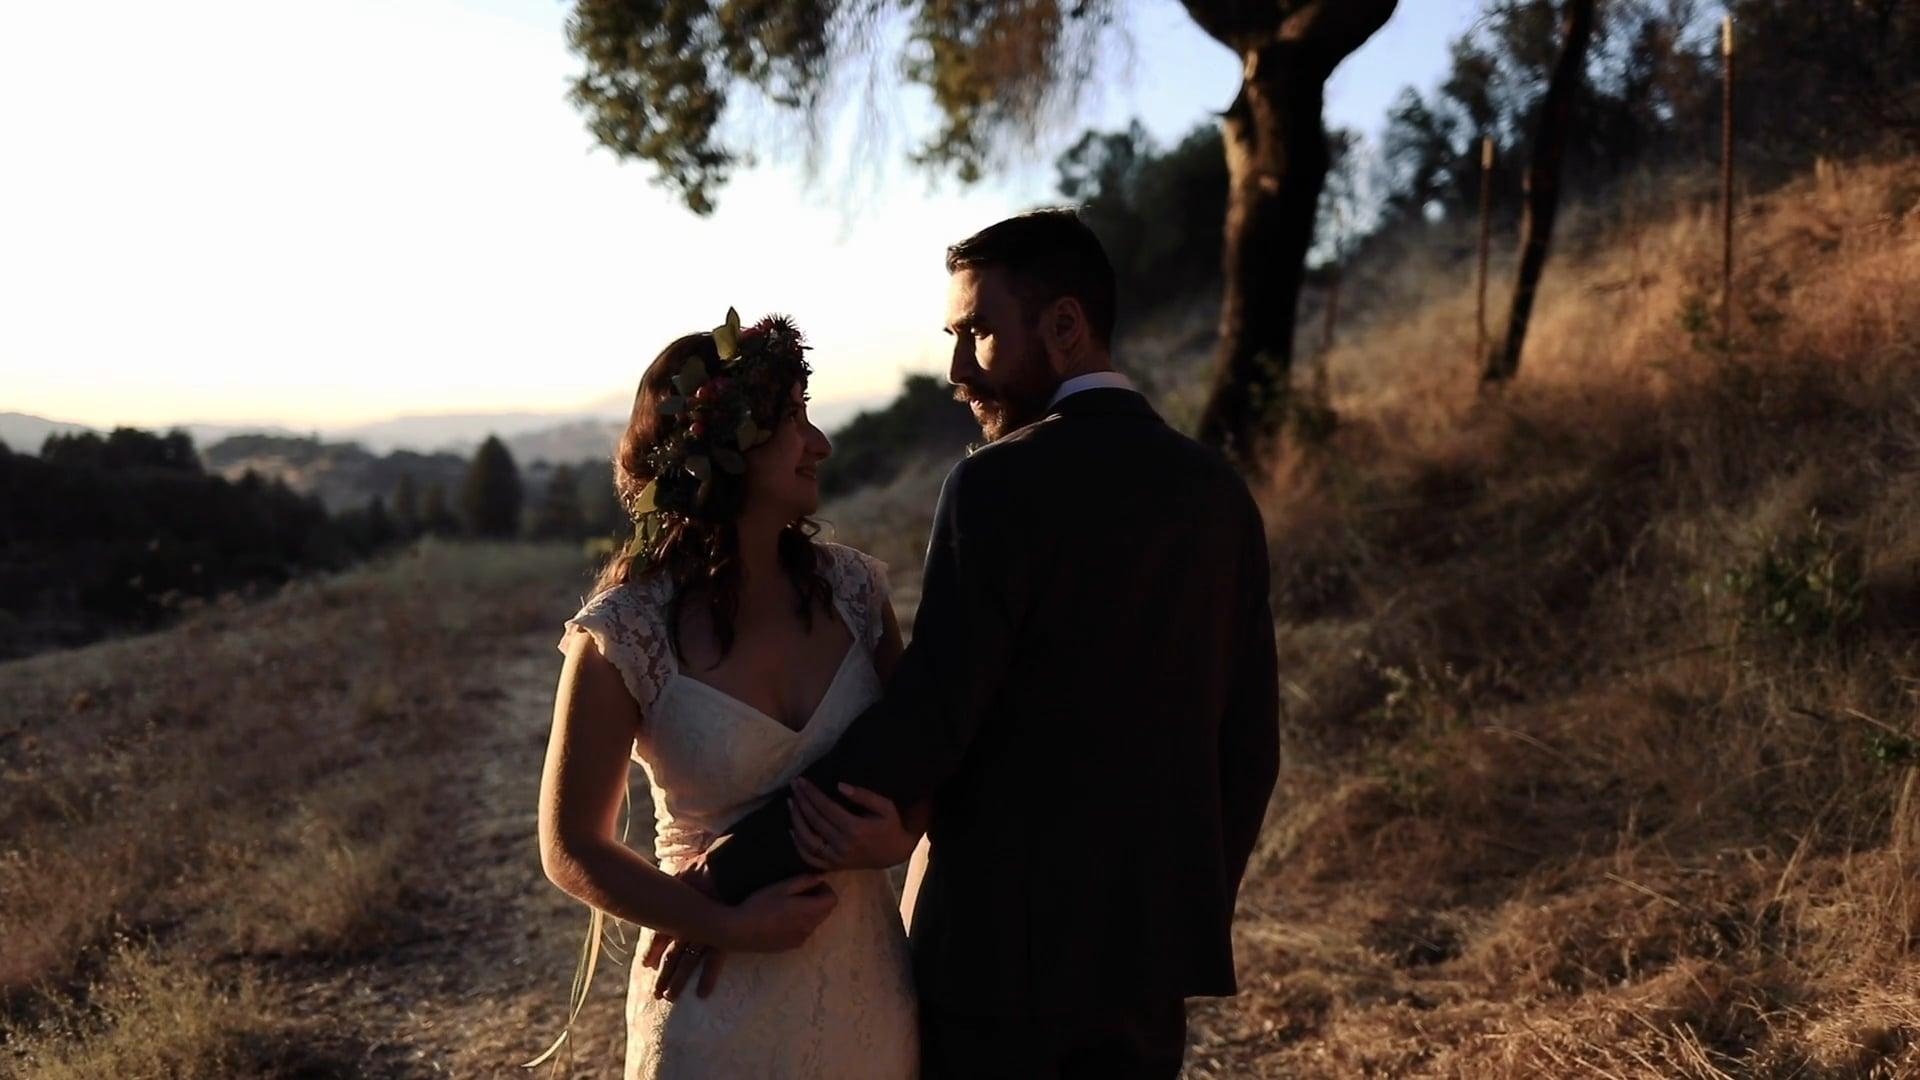 The Wedding of Meg & AJ // Hans Fahden, Calistoga, CA